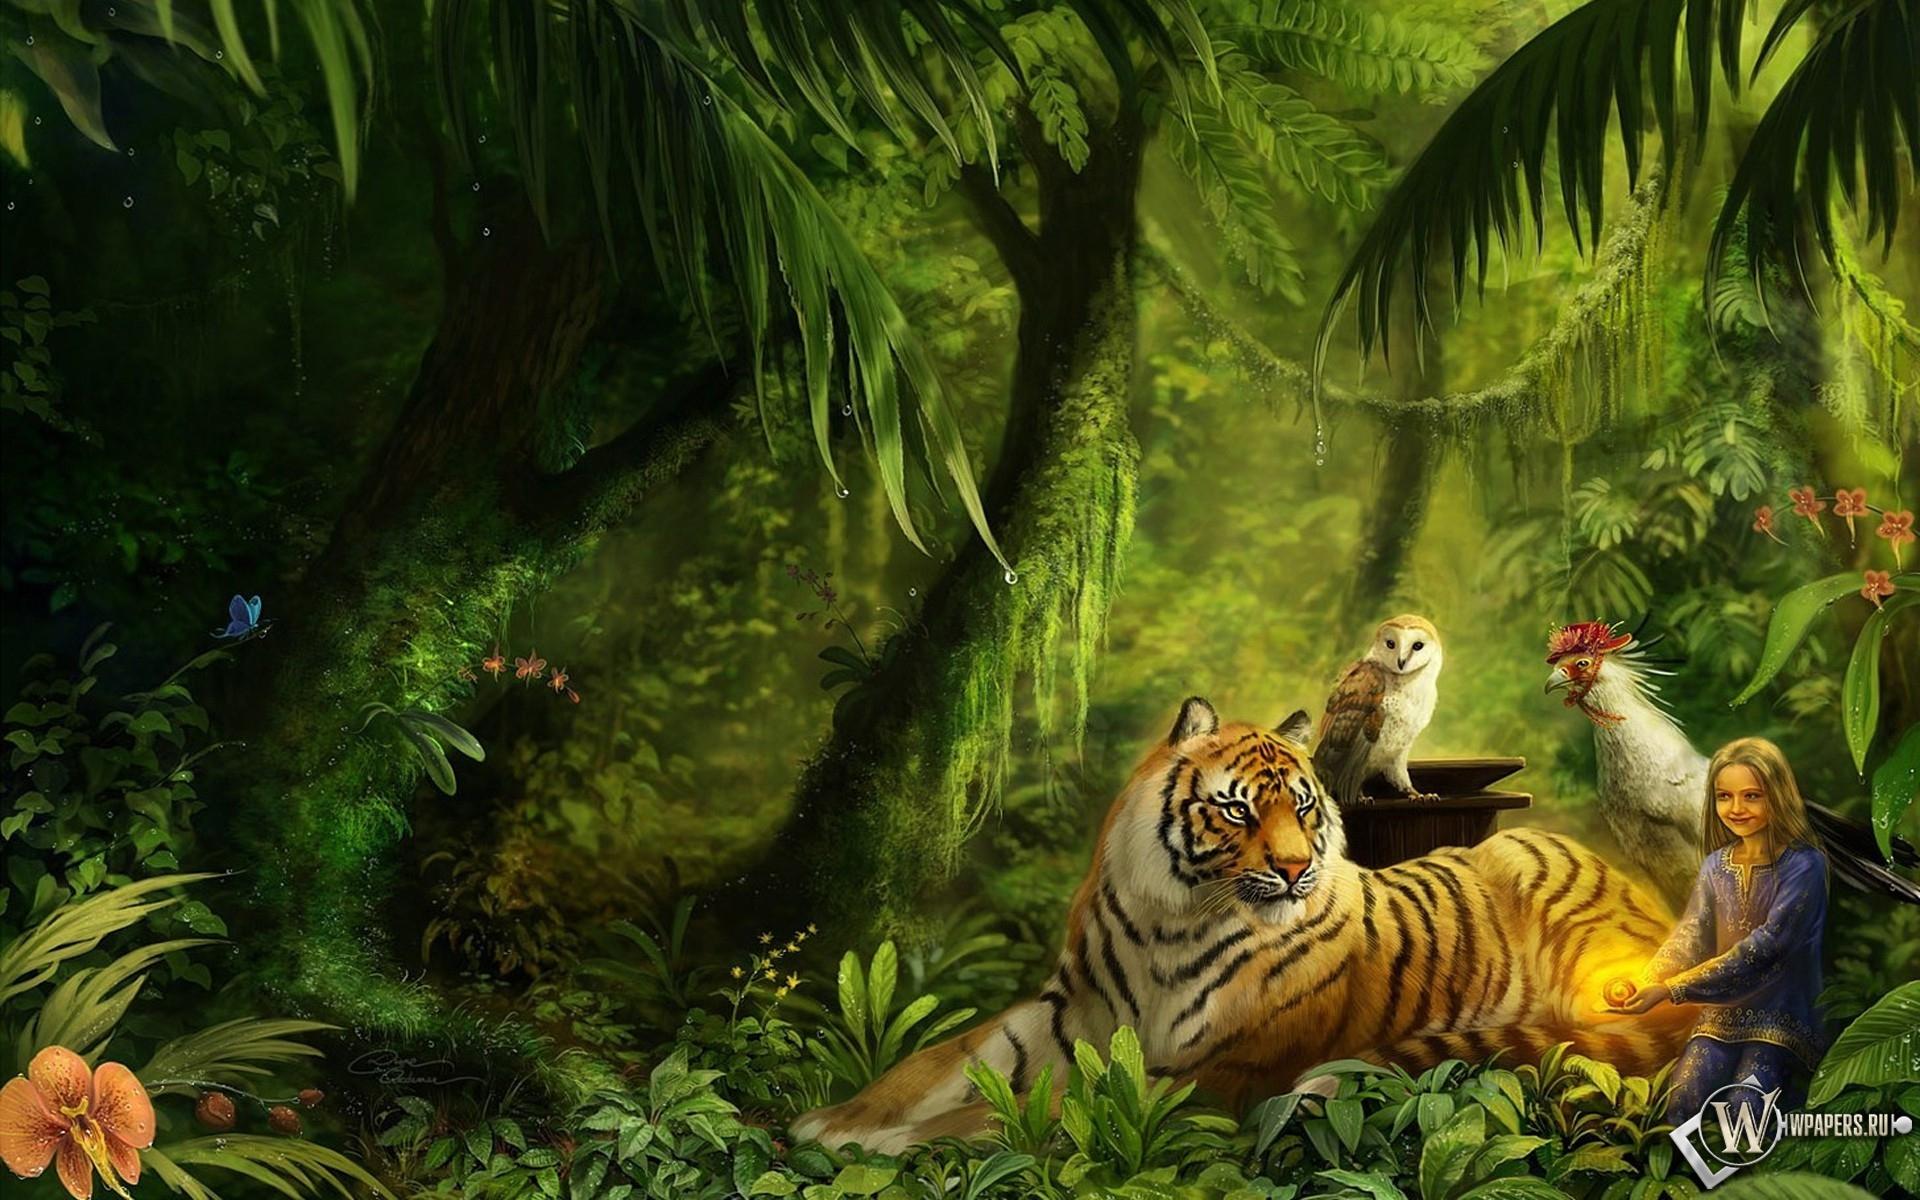 Животные в лесу 1920x1200